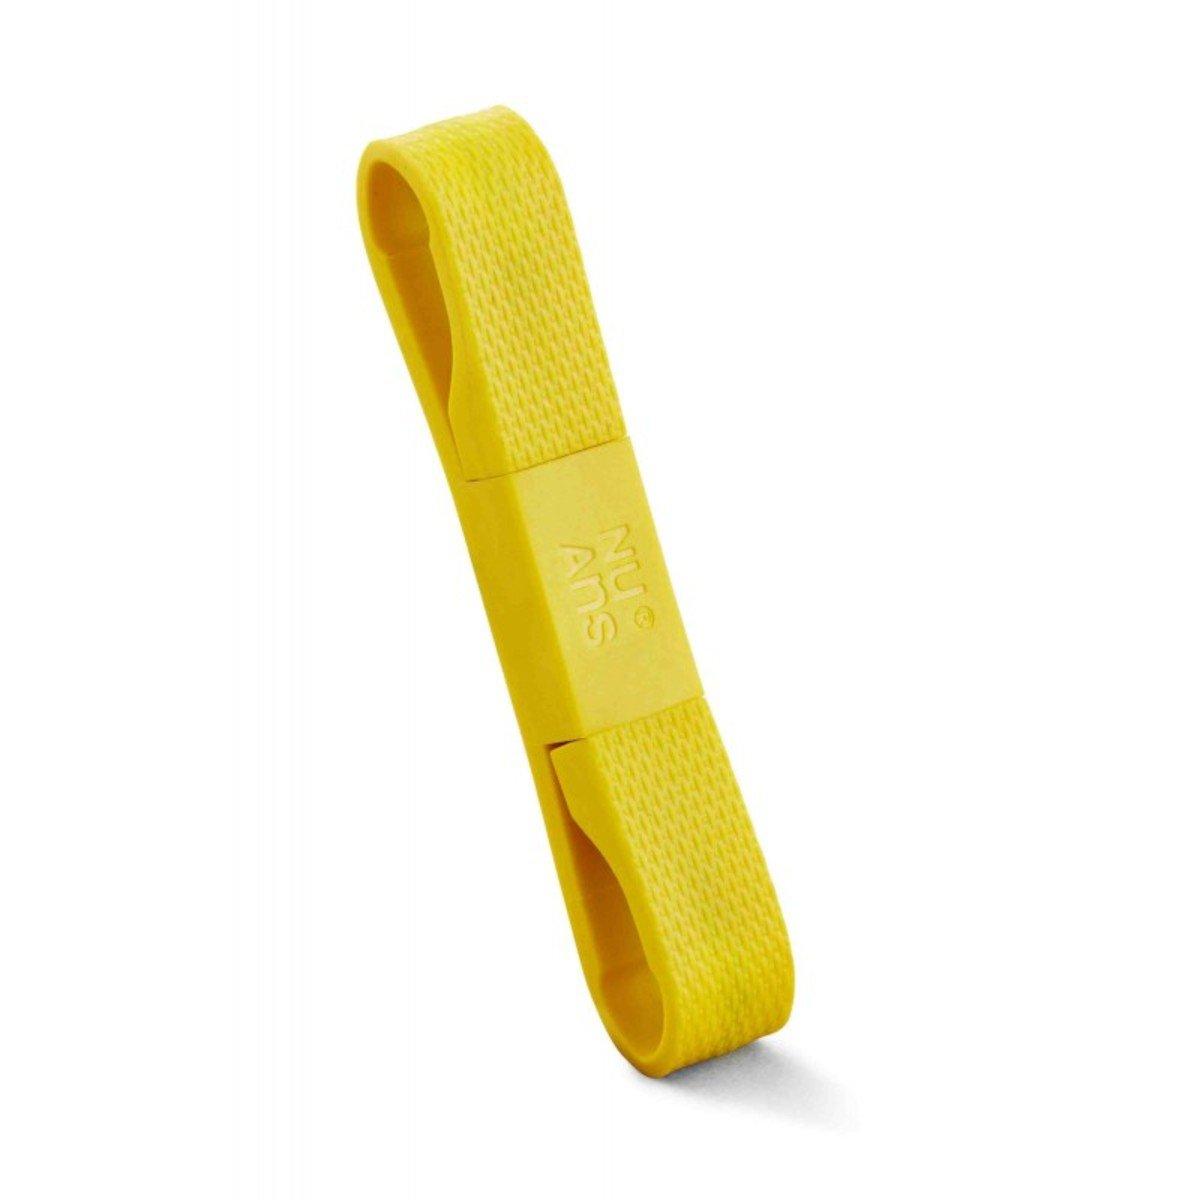 BANDWIRE Lightning cable MFI (蘋果授權) 傳輸充電線 - 黃色